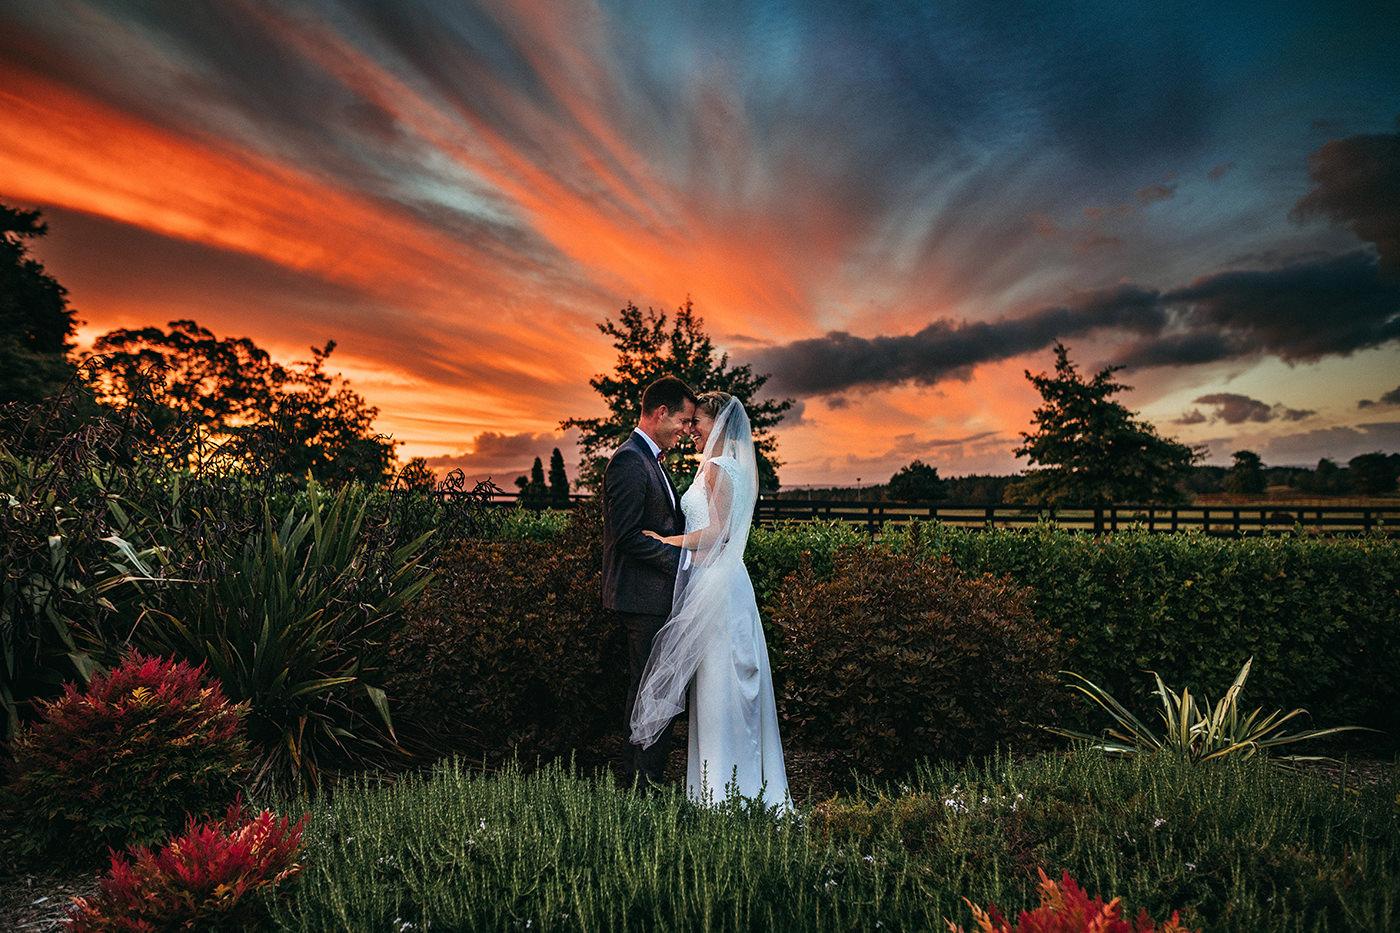 wedding_photographer_nz-00031.jpg